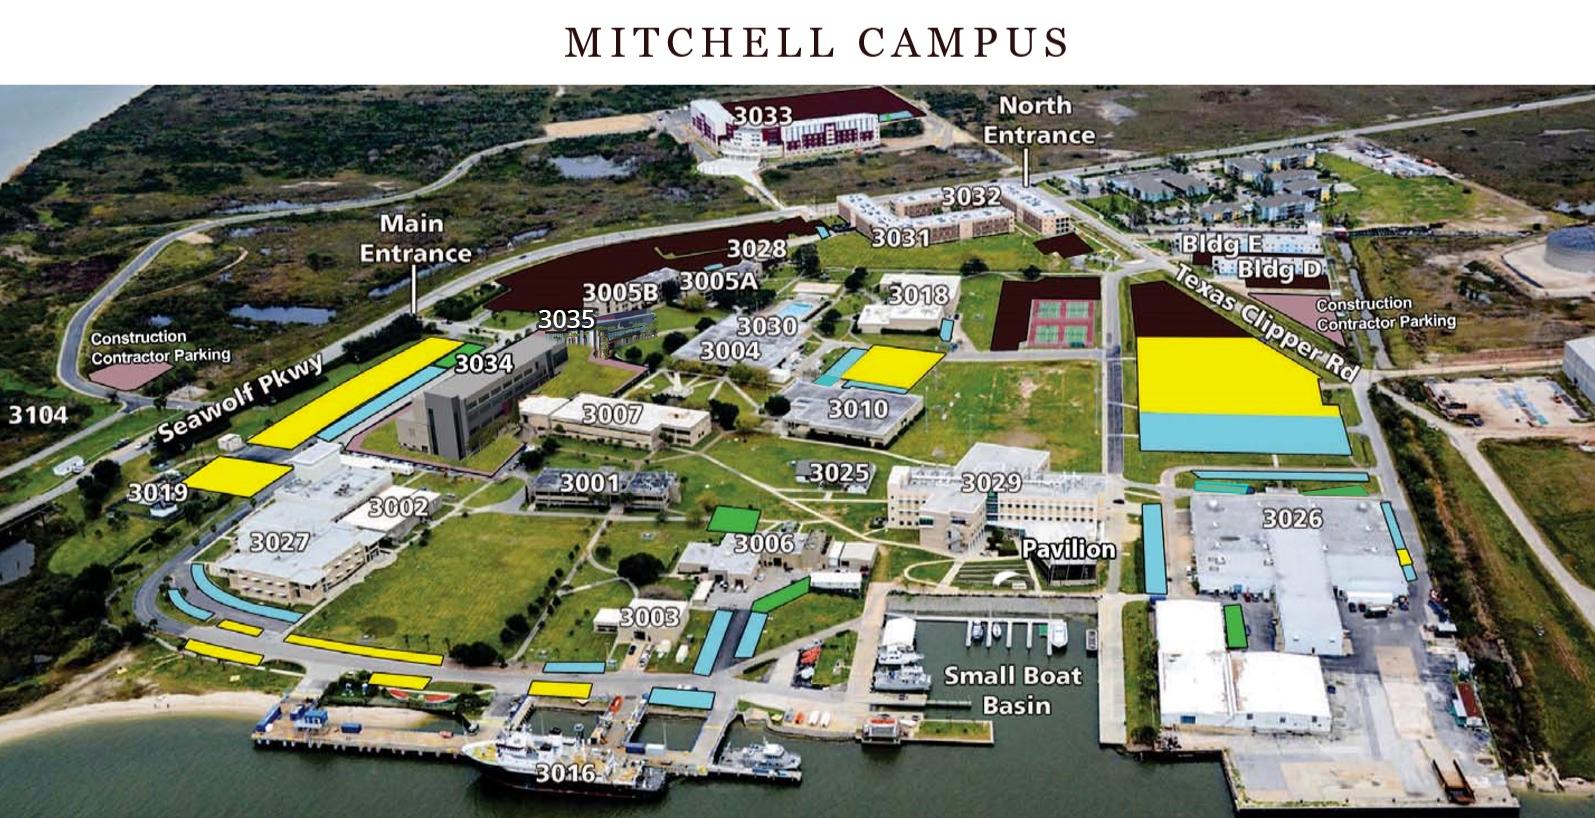 texas a m galveston campus map Texas A M University Galveston Campus Maps And Directions Texas